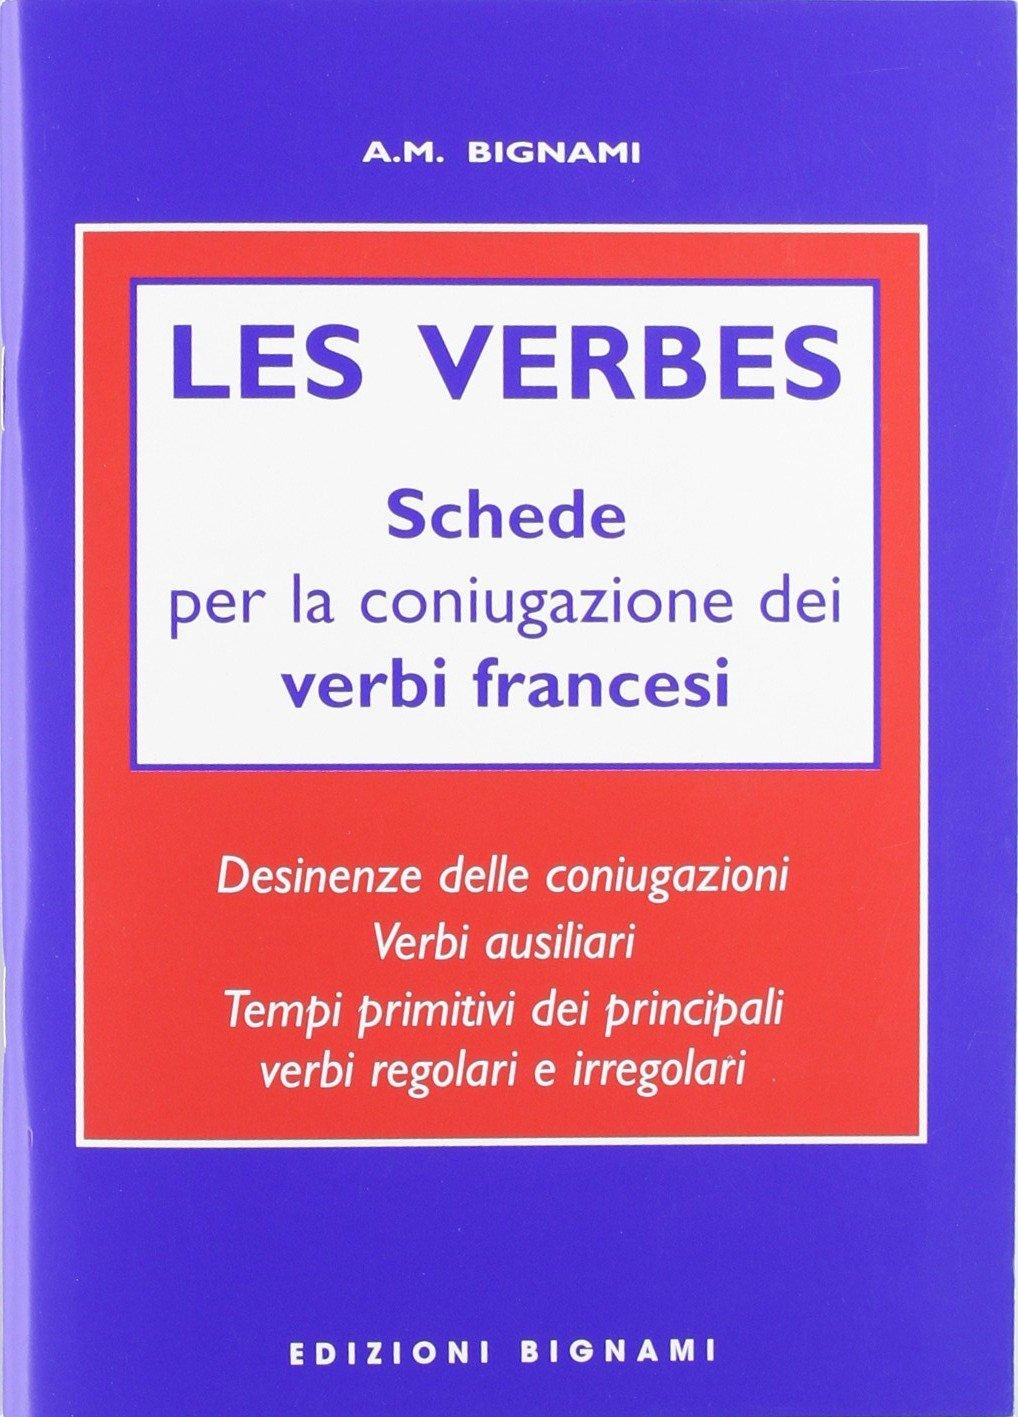 Ben noto Les verbes. Schede per coniugazione verbi francesi. Ediz. italiana  AD84